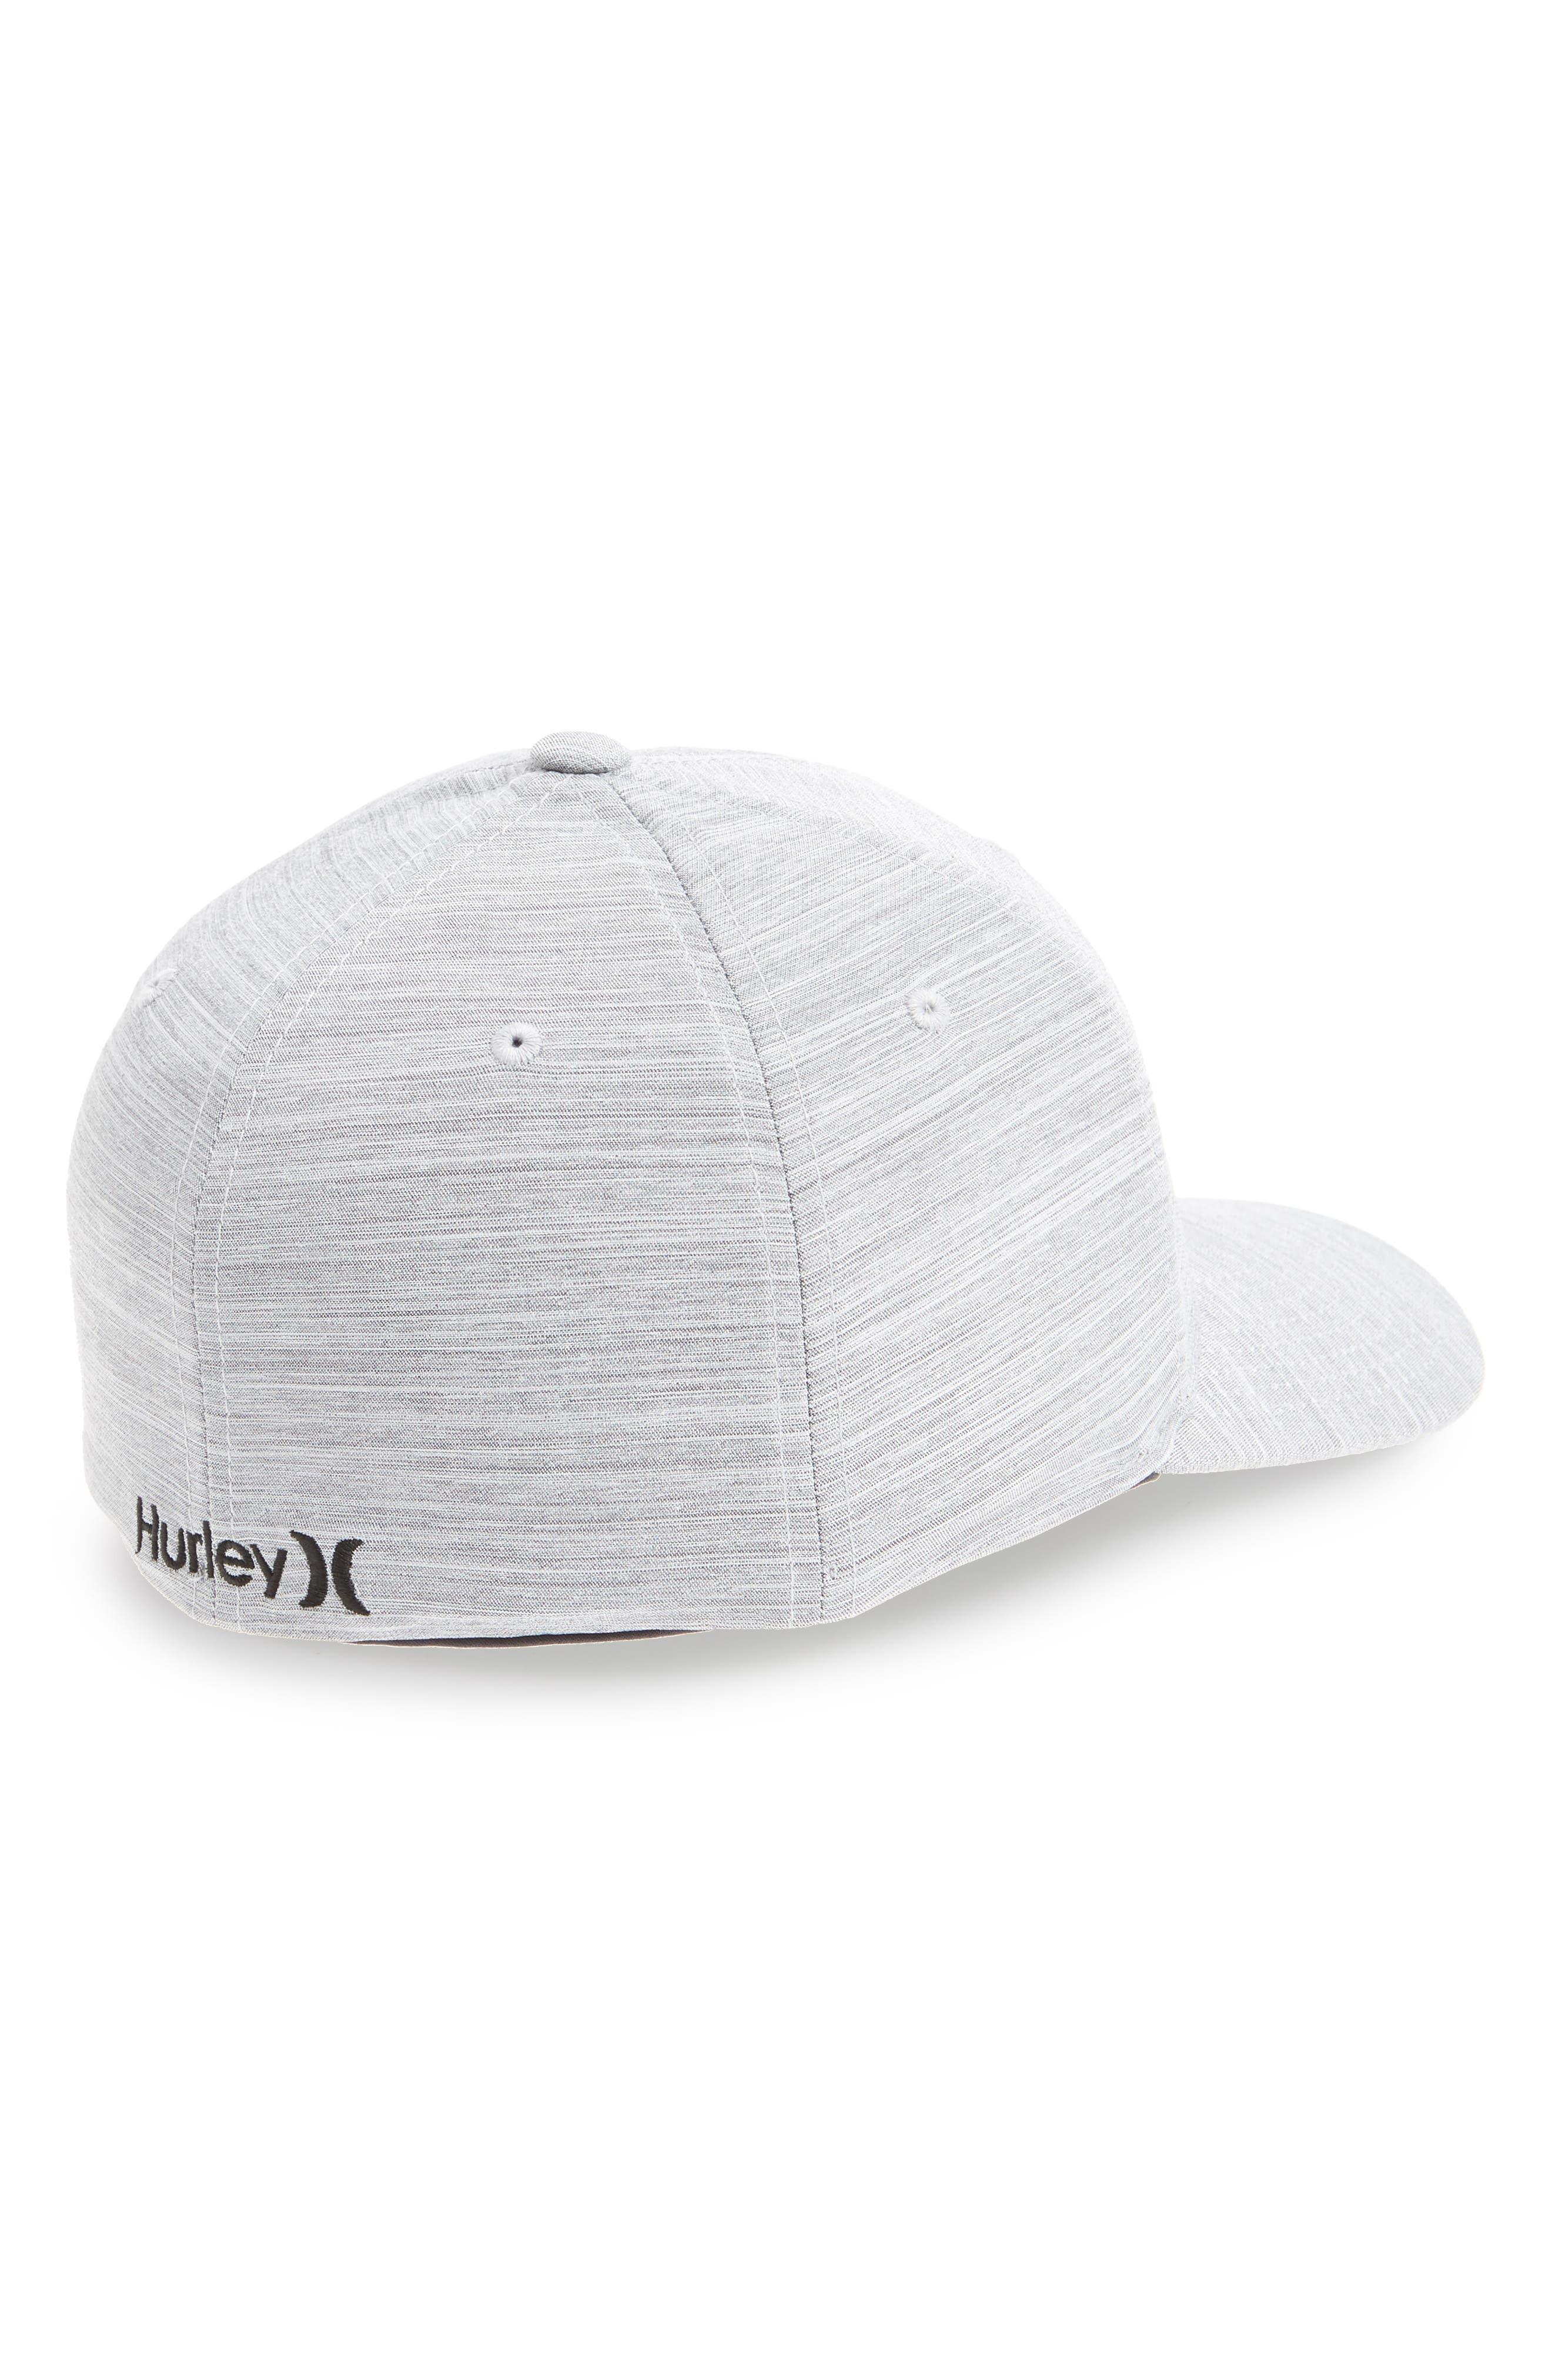 hot sale online 57580 a7772 ... low cost mens hurley hats hats for men nordstrom e1de9 af631